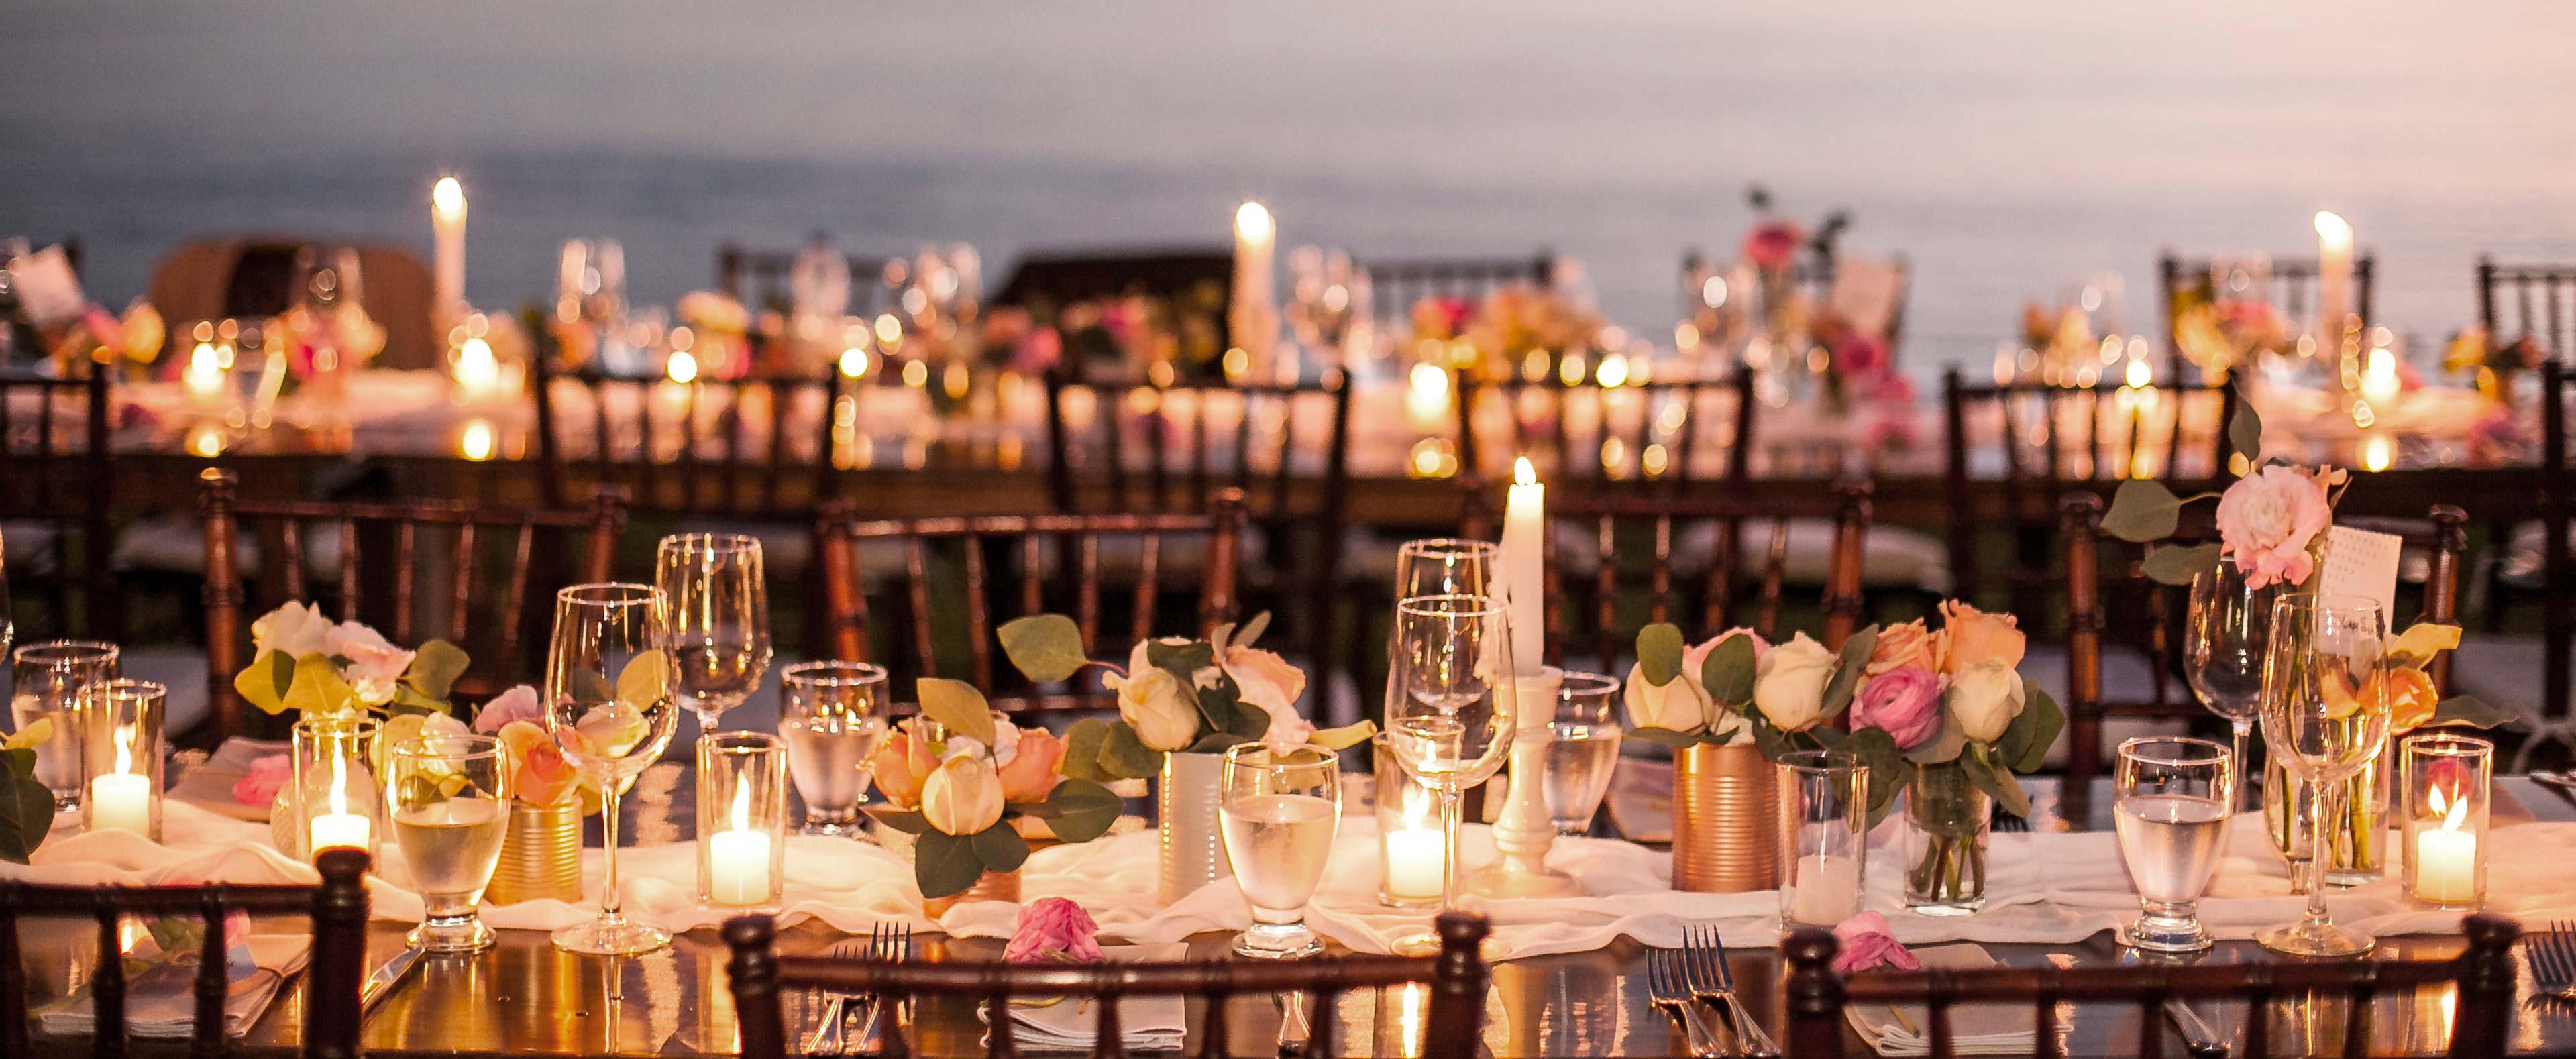 The Wedding Club - Services - Party di fidanzamento